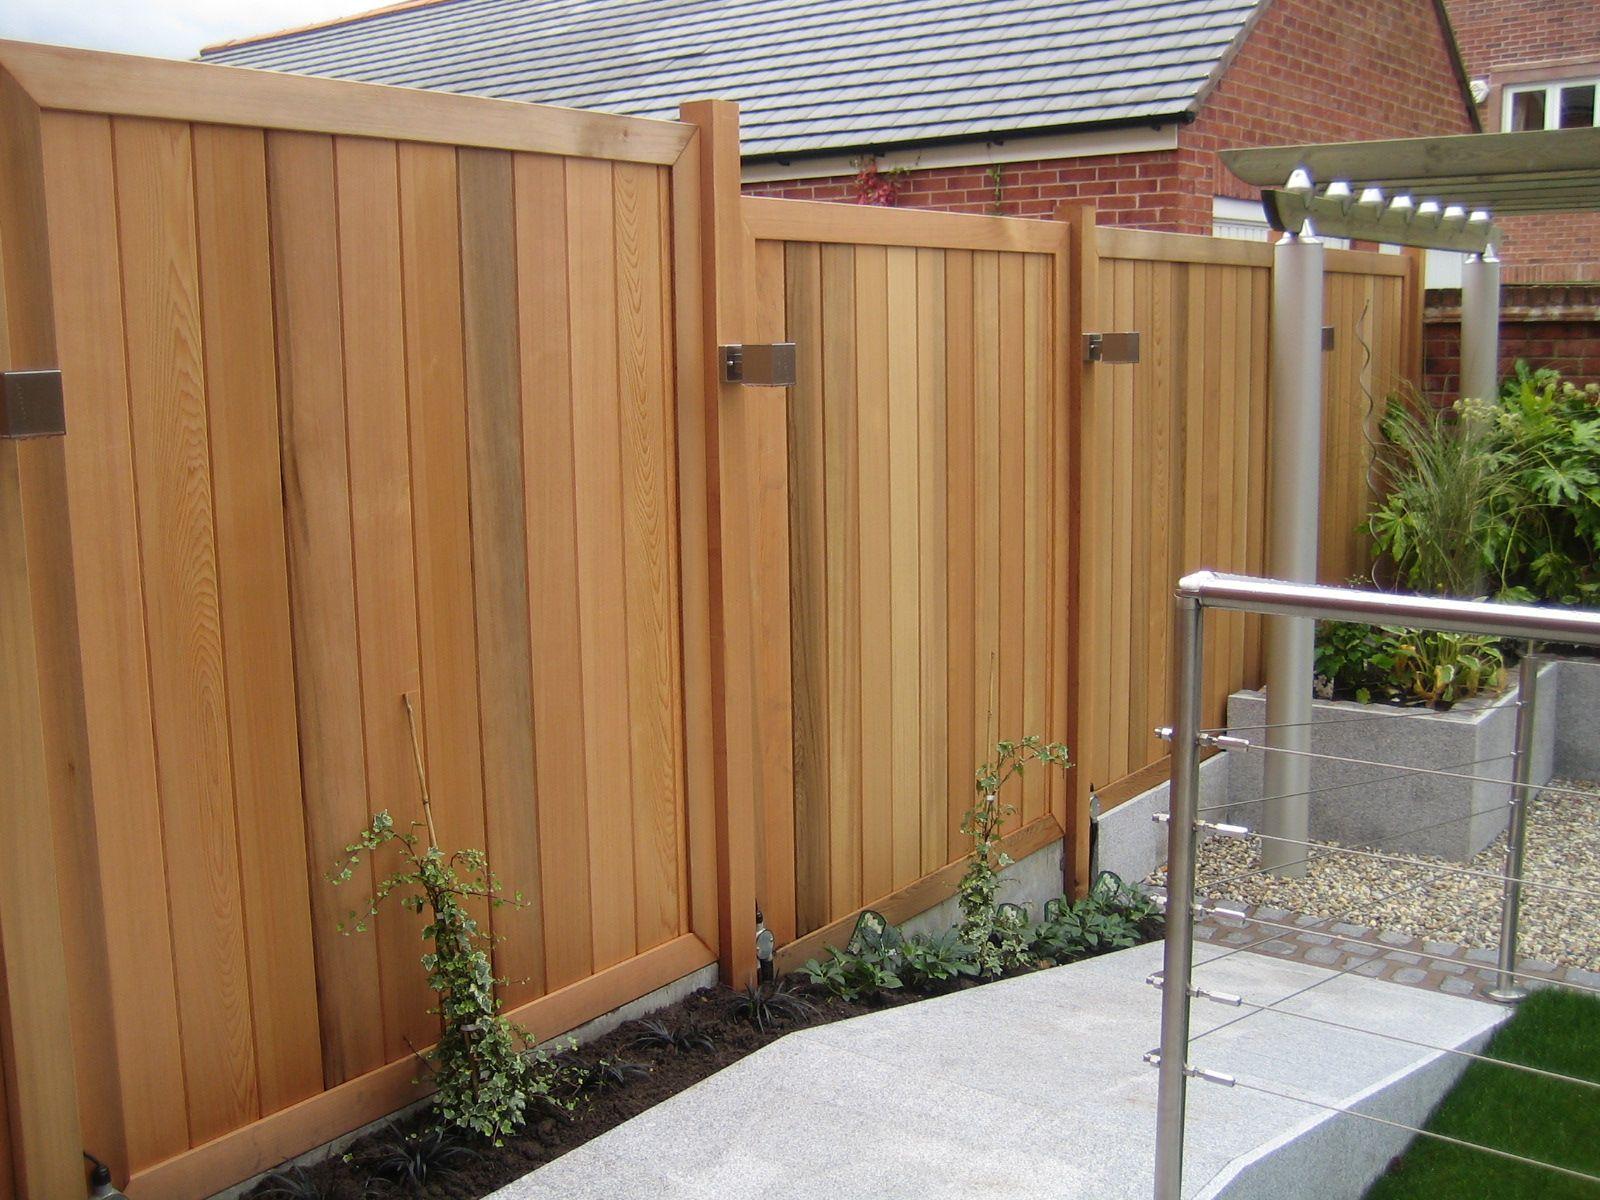 Image result for cedar fencing